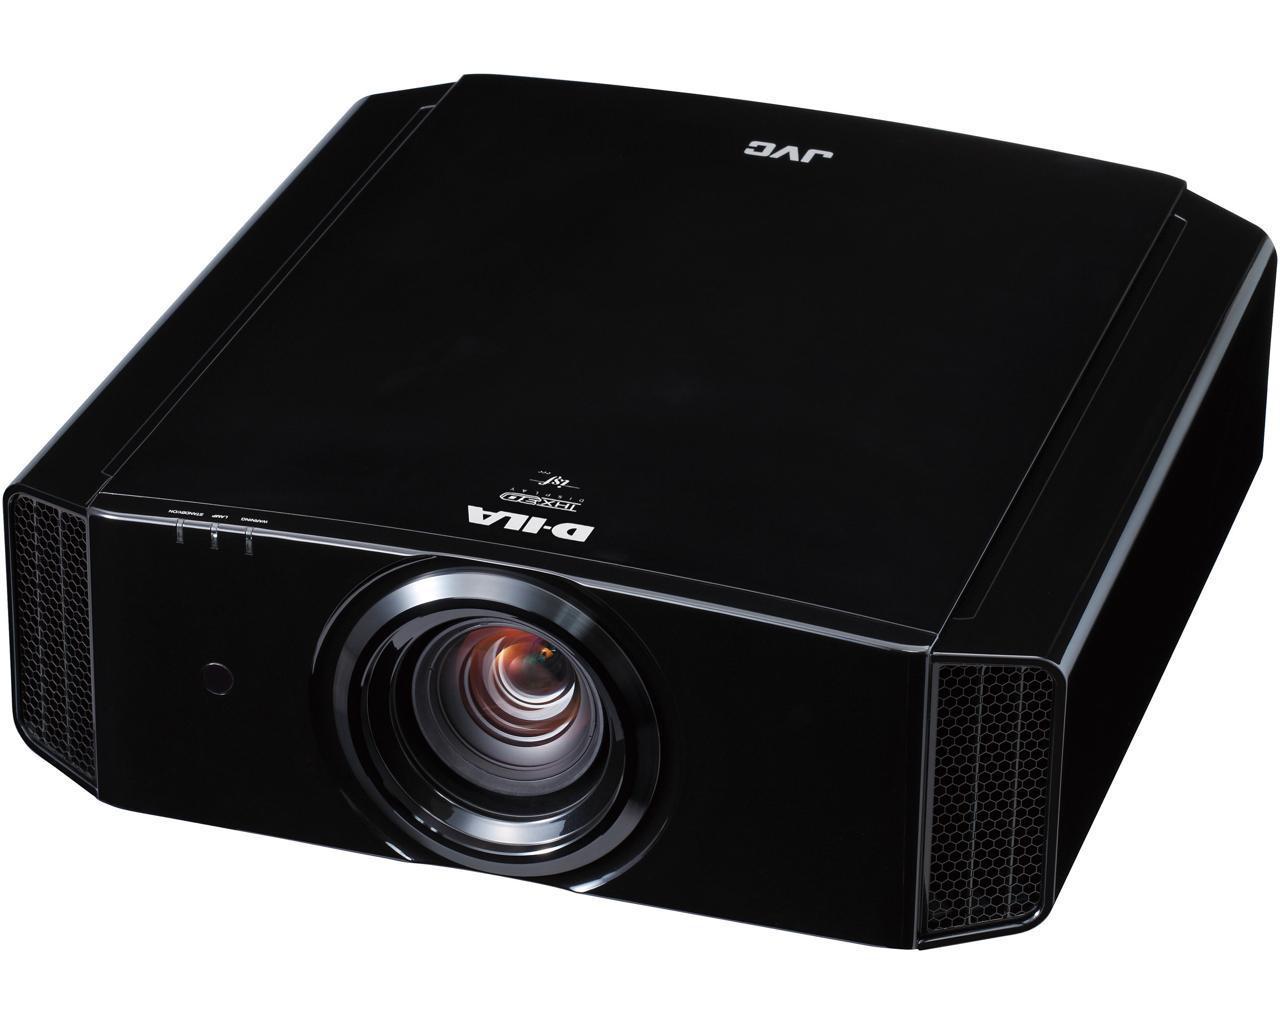 JVC DLA-X7900 schwarz 4K UltraHD HDR 3D Beamer